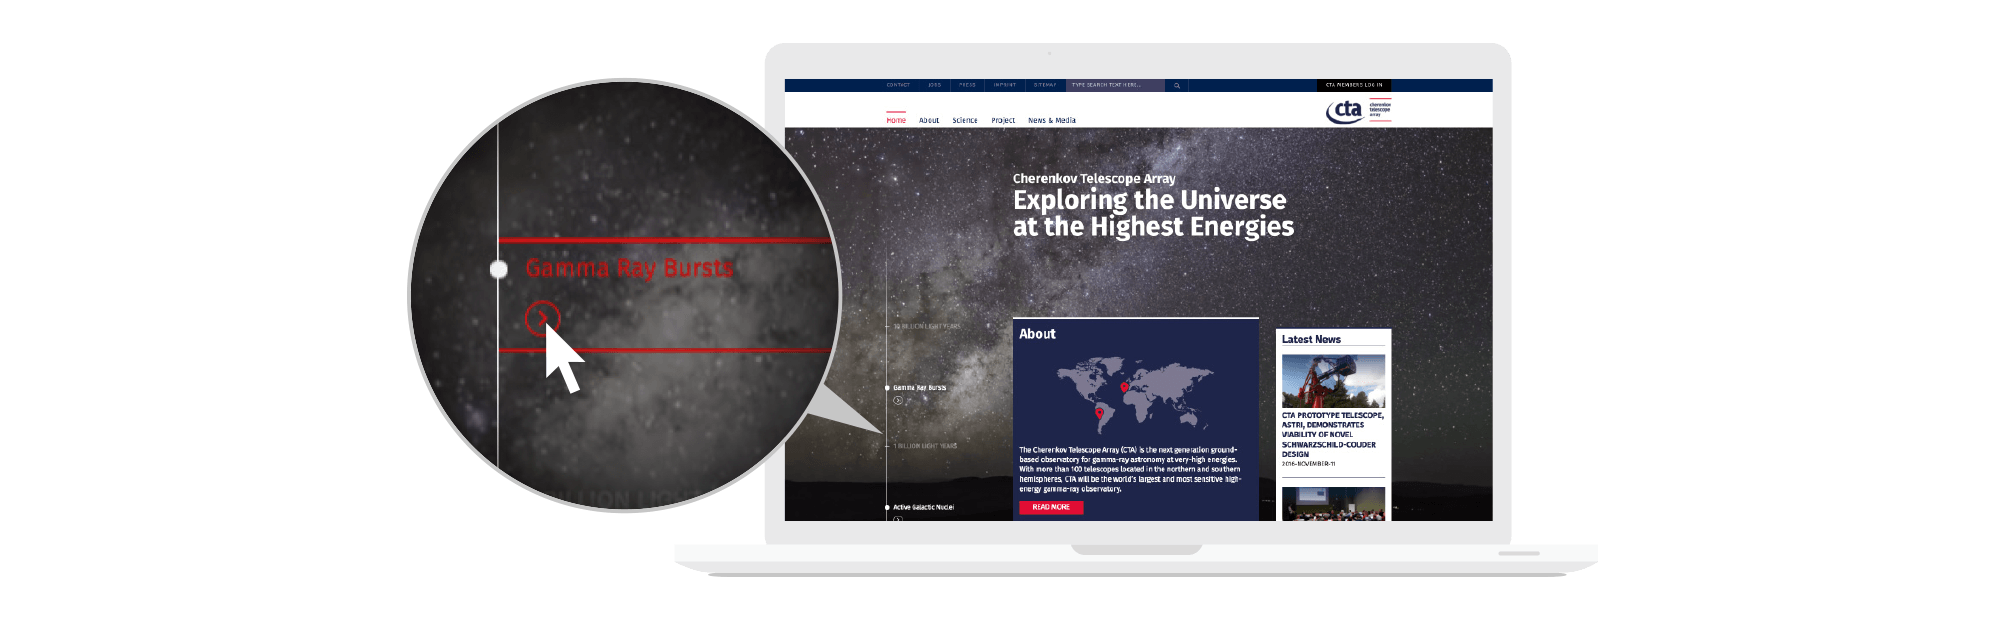 360VIER_CTAO_Slider_Webdesign_03 Cherenkov Telescope Array Observatory Gmbh